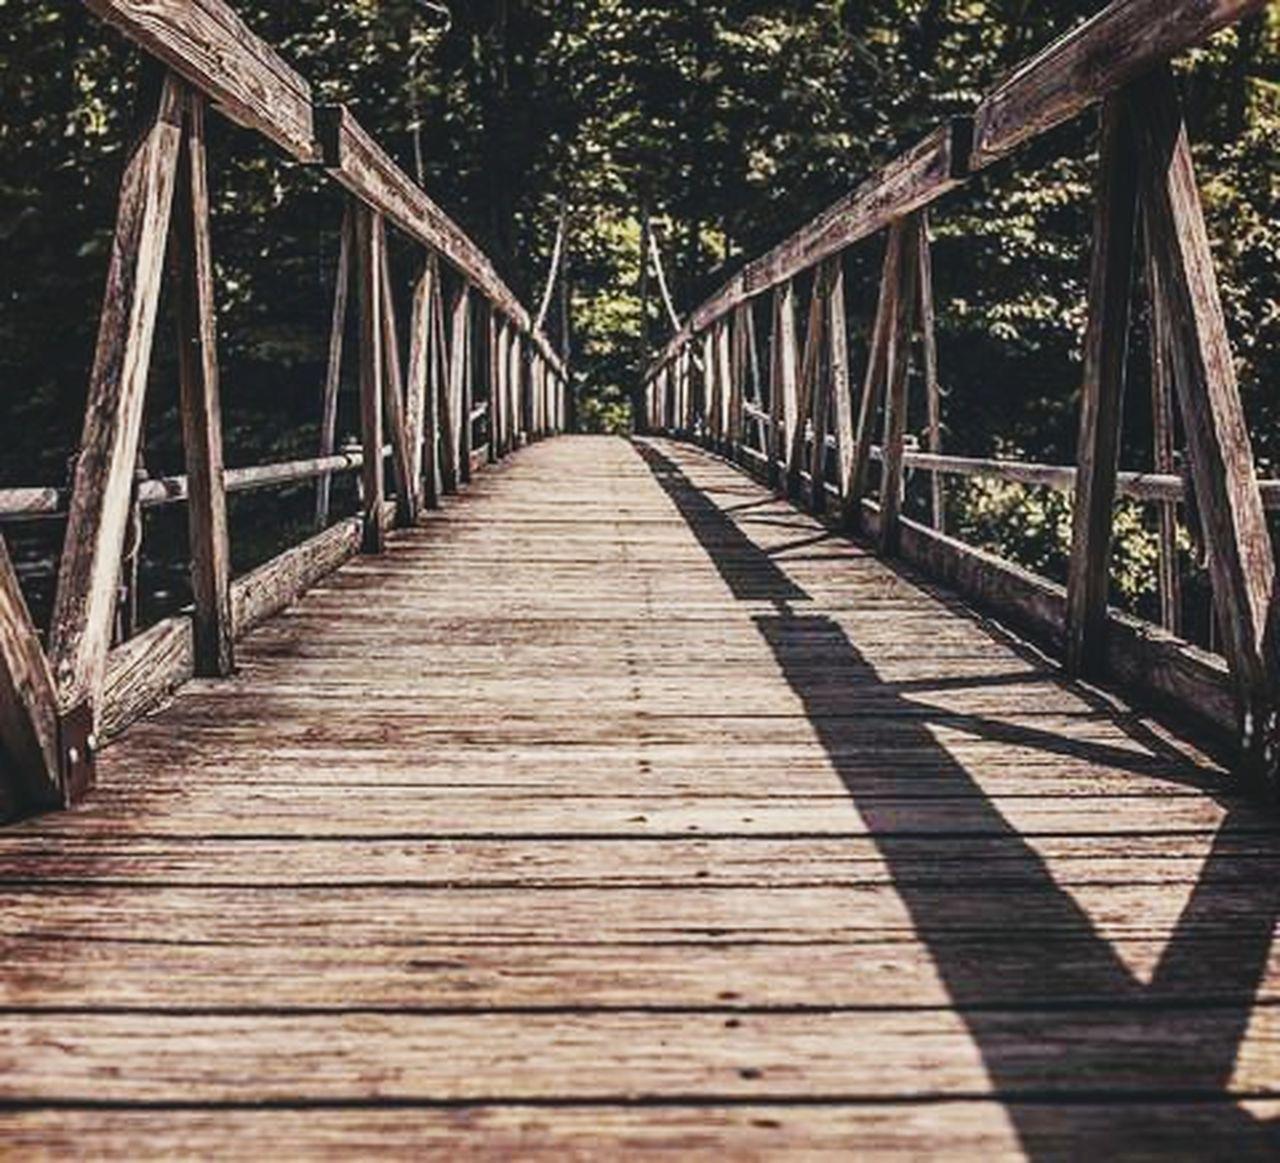 Ajantacaves Wooden Bridge Iphone6s Photography